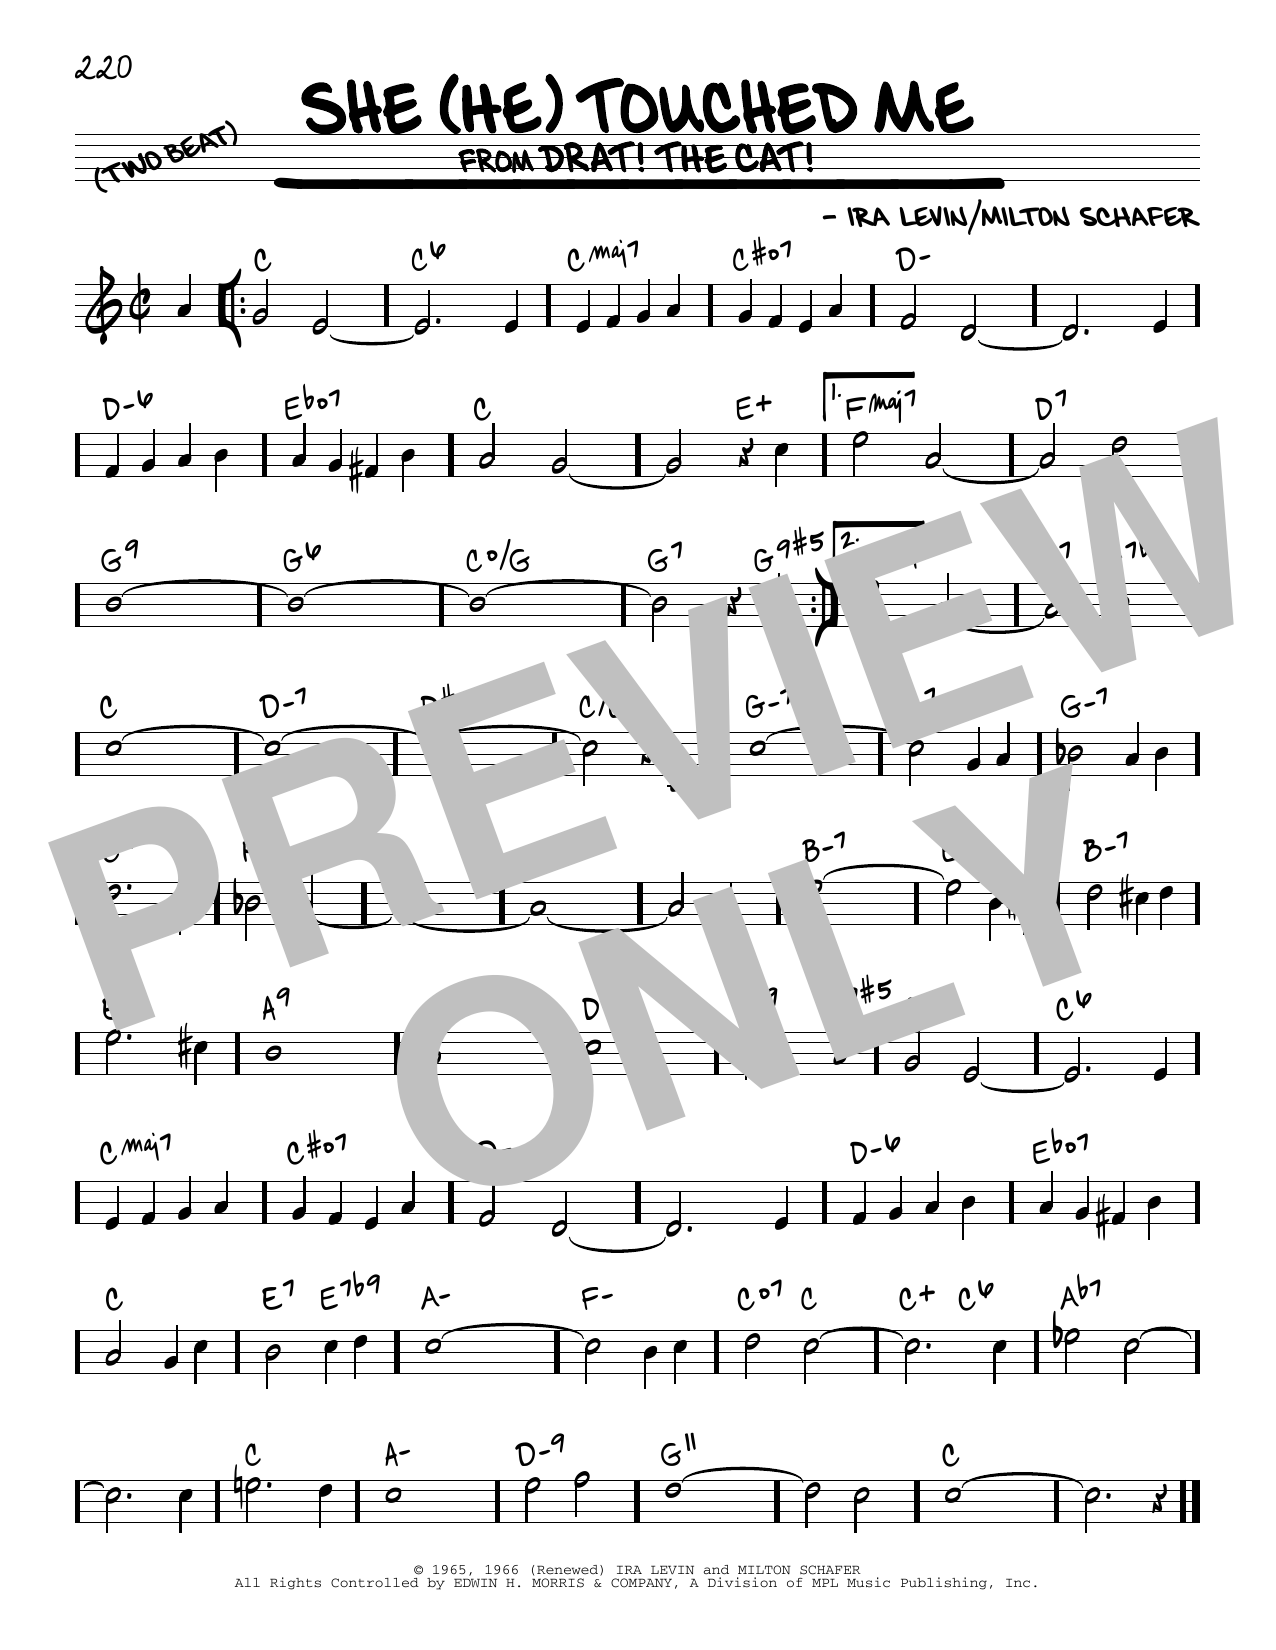 Sheet Music Digital Files To Print Licensed Milton Schafer Digital